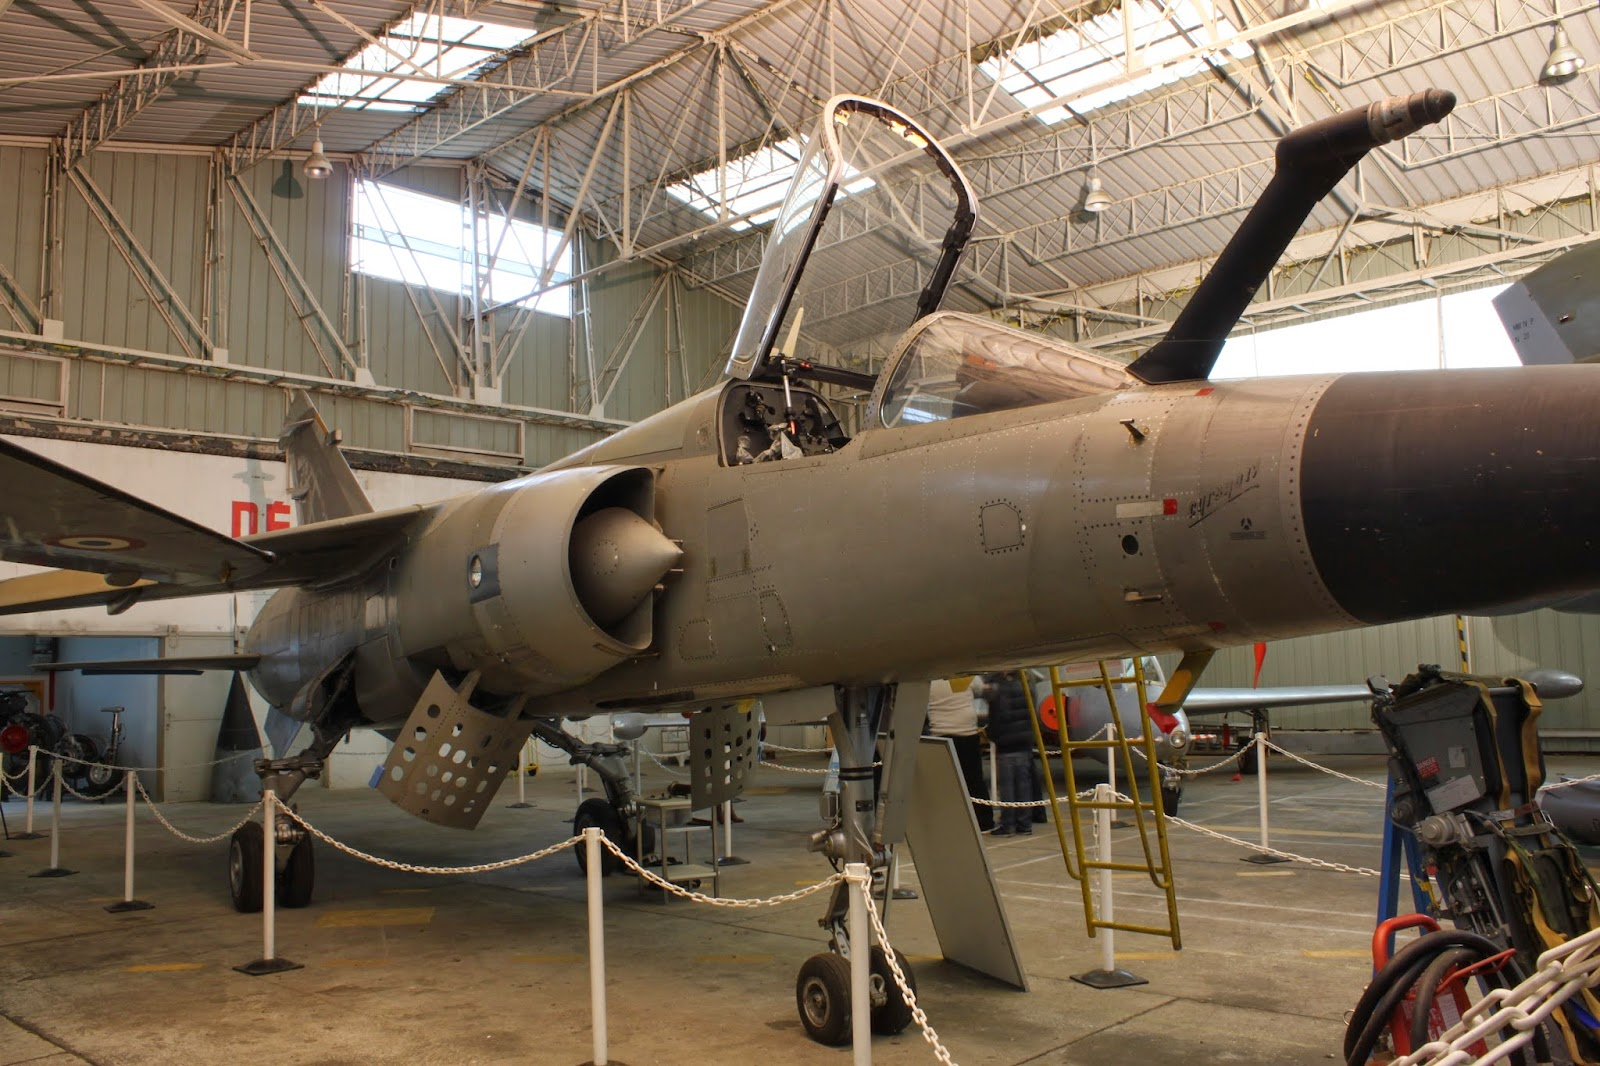 Musée Clément Ader EALC Corbas avions 2014